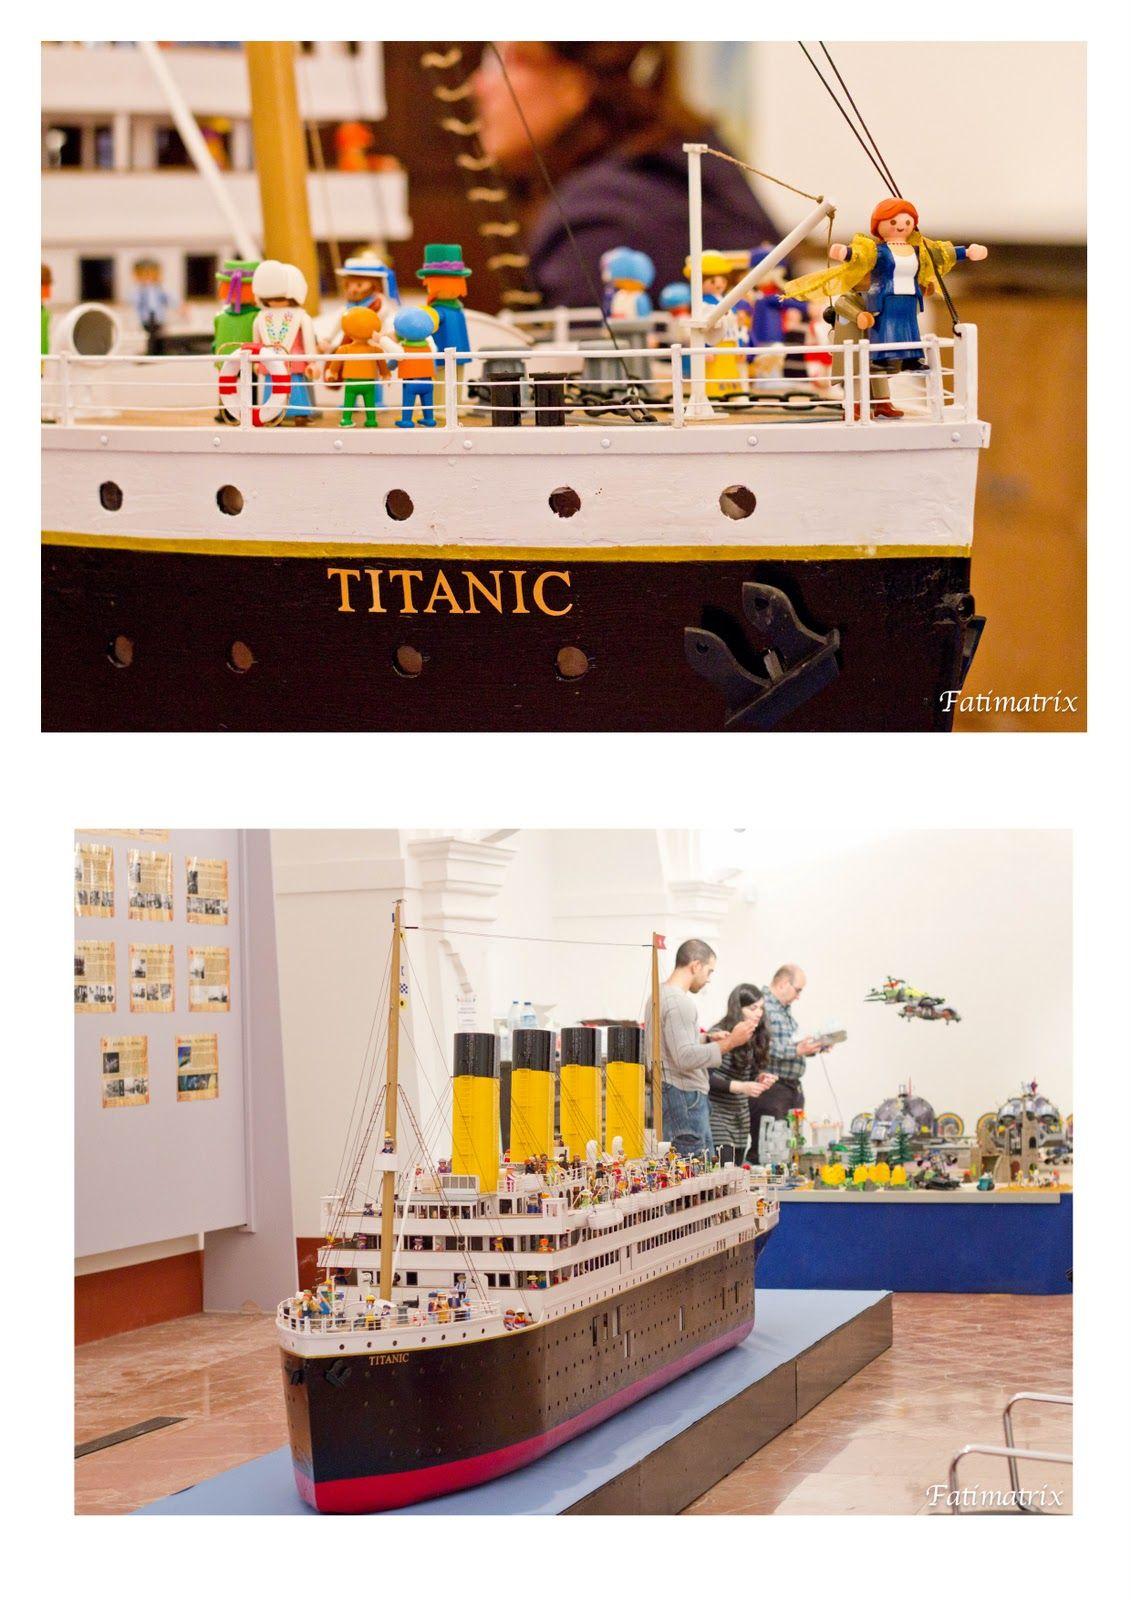 Playmobil Titanic Playmobil Pinterest Playmobil Ayer Y  # Muebles Titanic